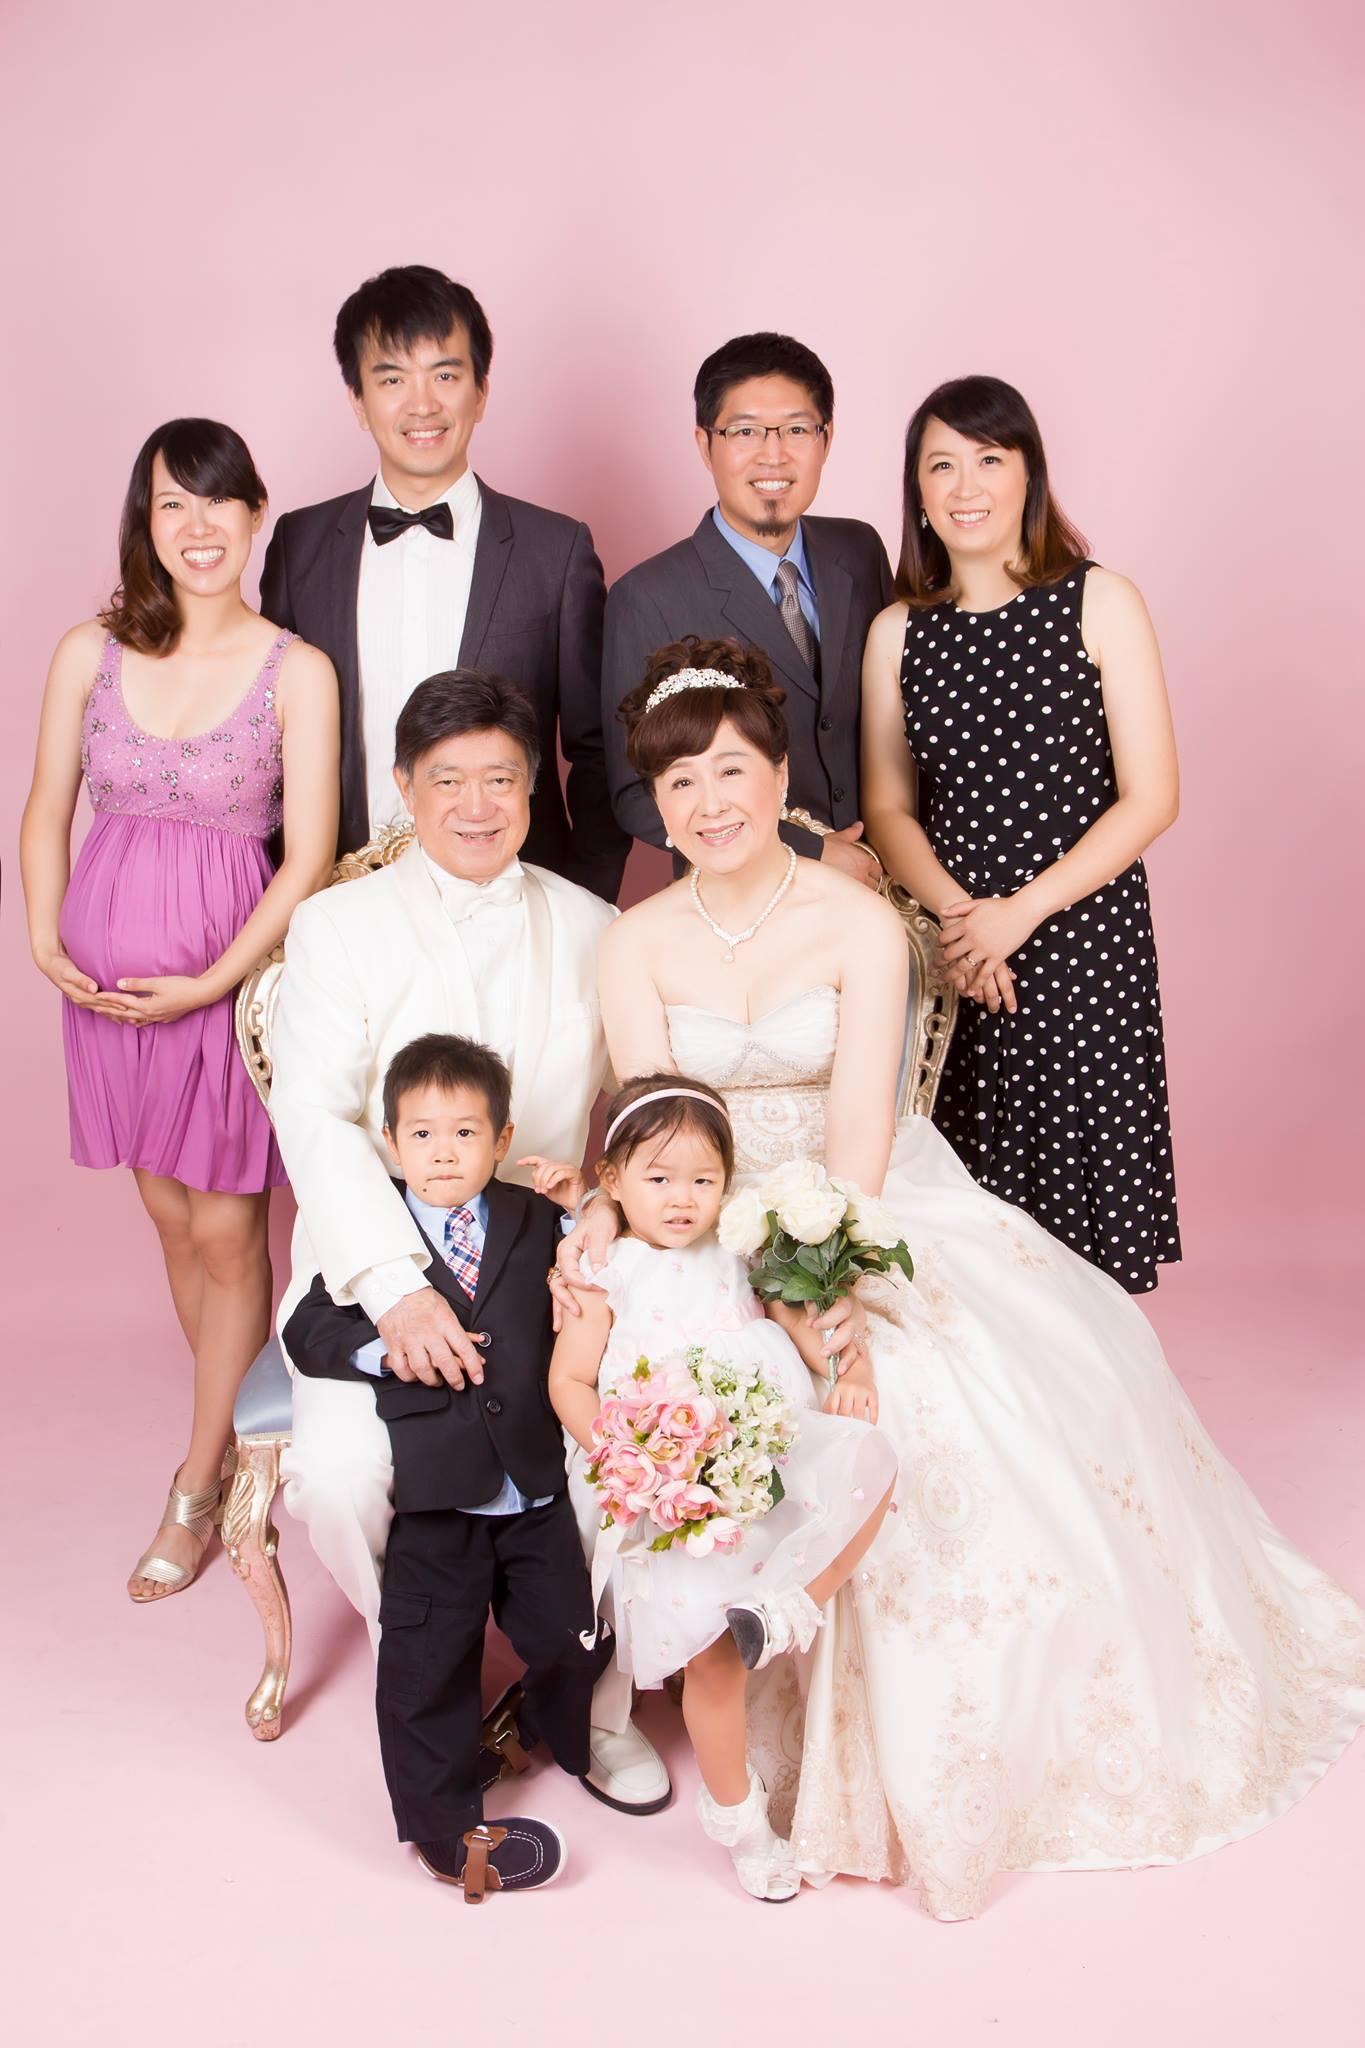 2015 全家福照 (1)